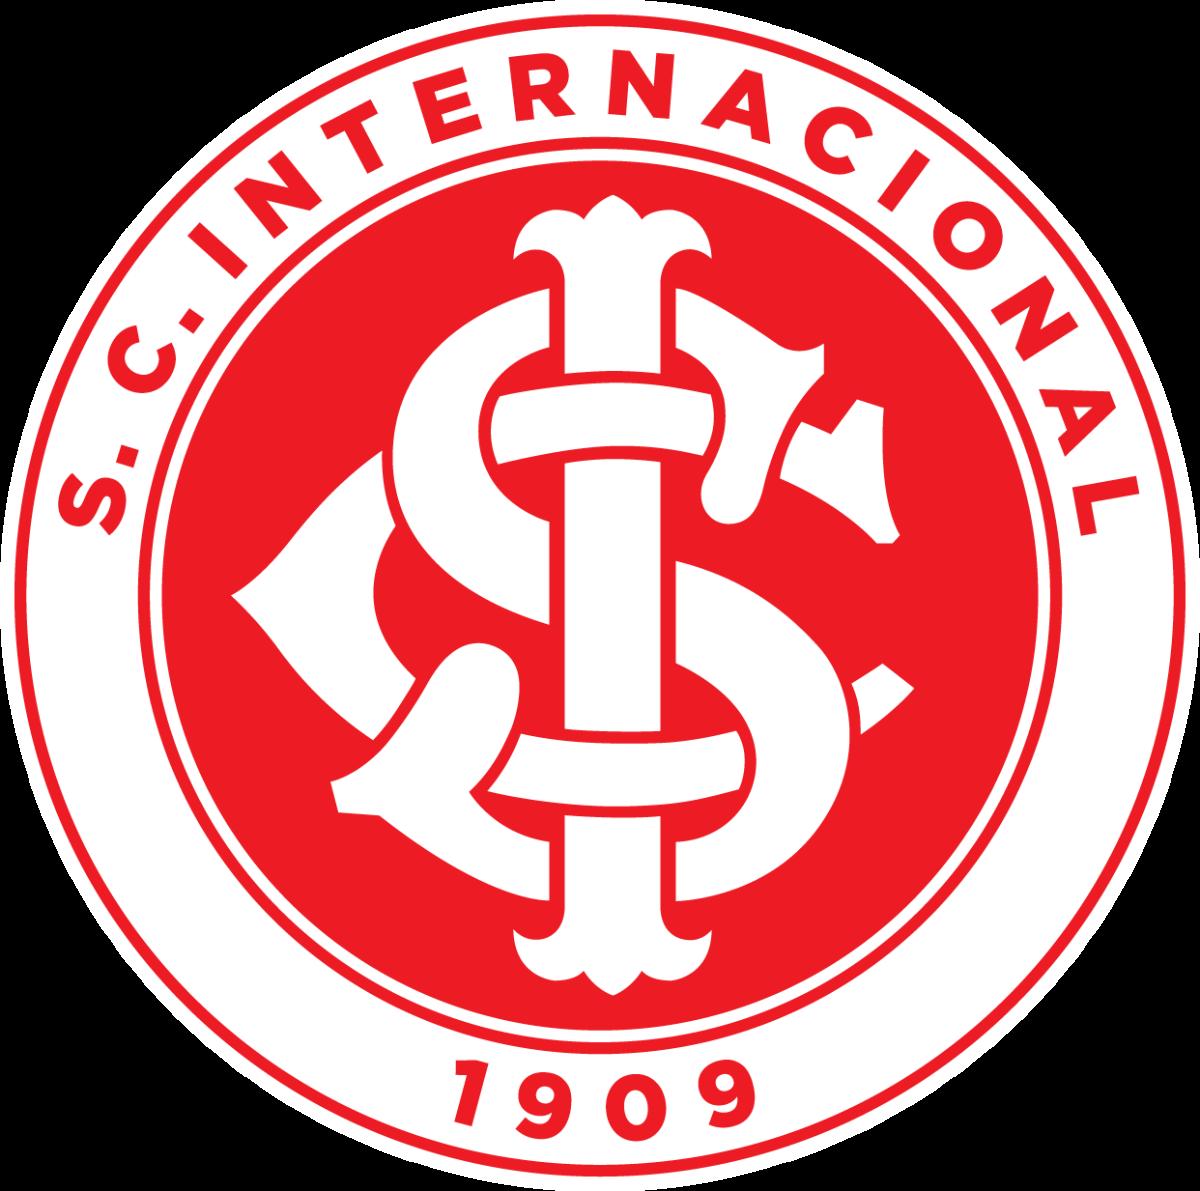 Places Internacional